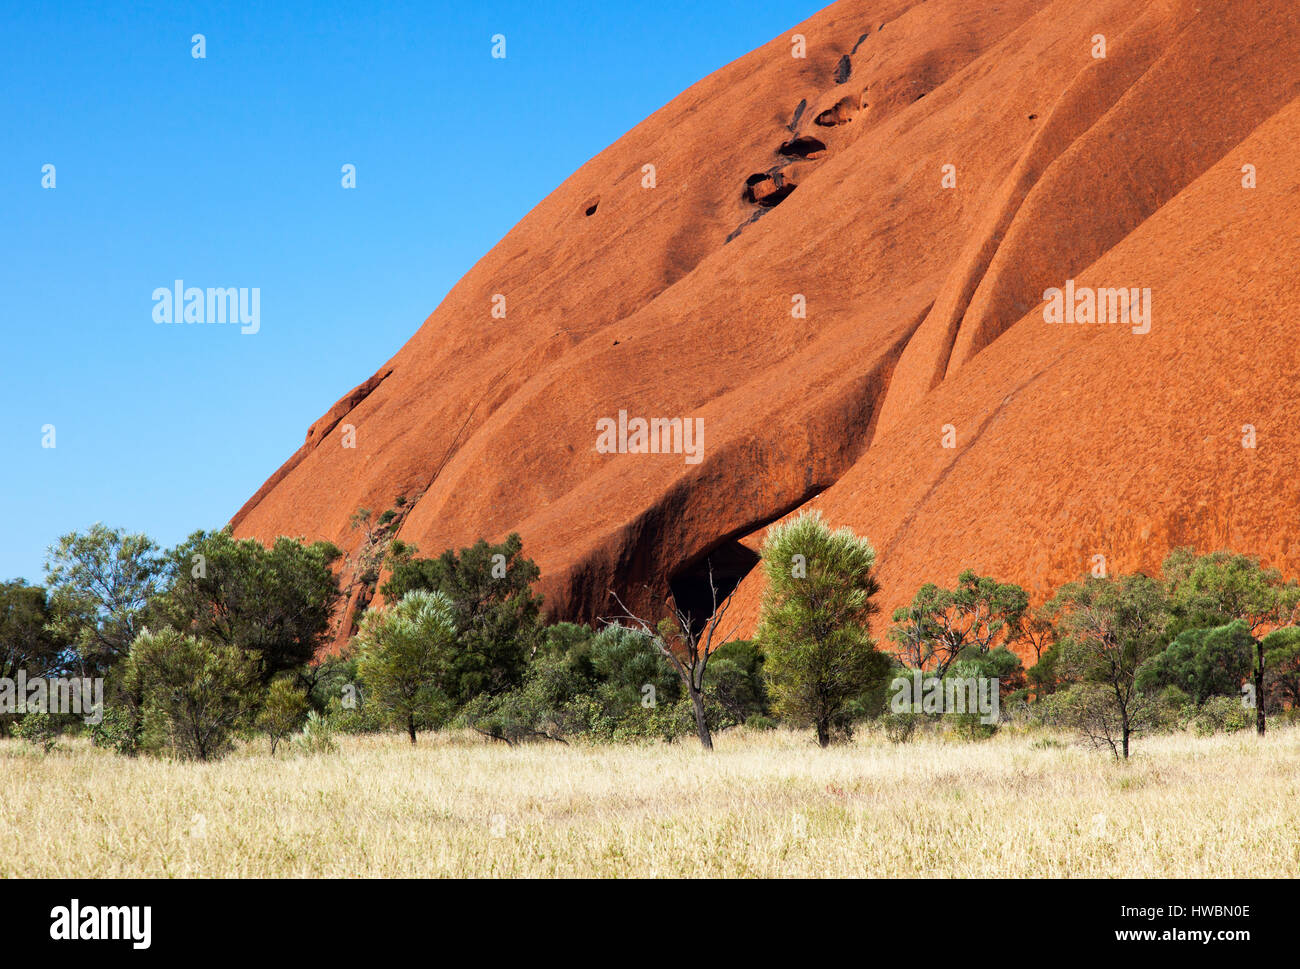 Uluru, Uluru-Kata Tjuta National Park, Northern Territory, Australia - Stock Image